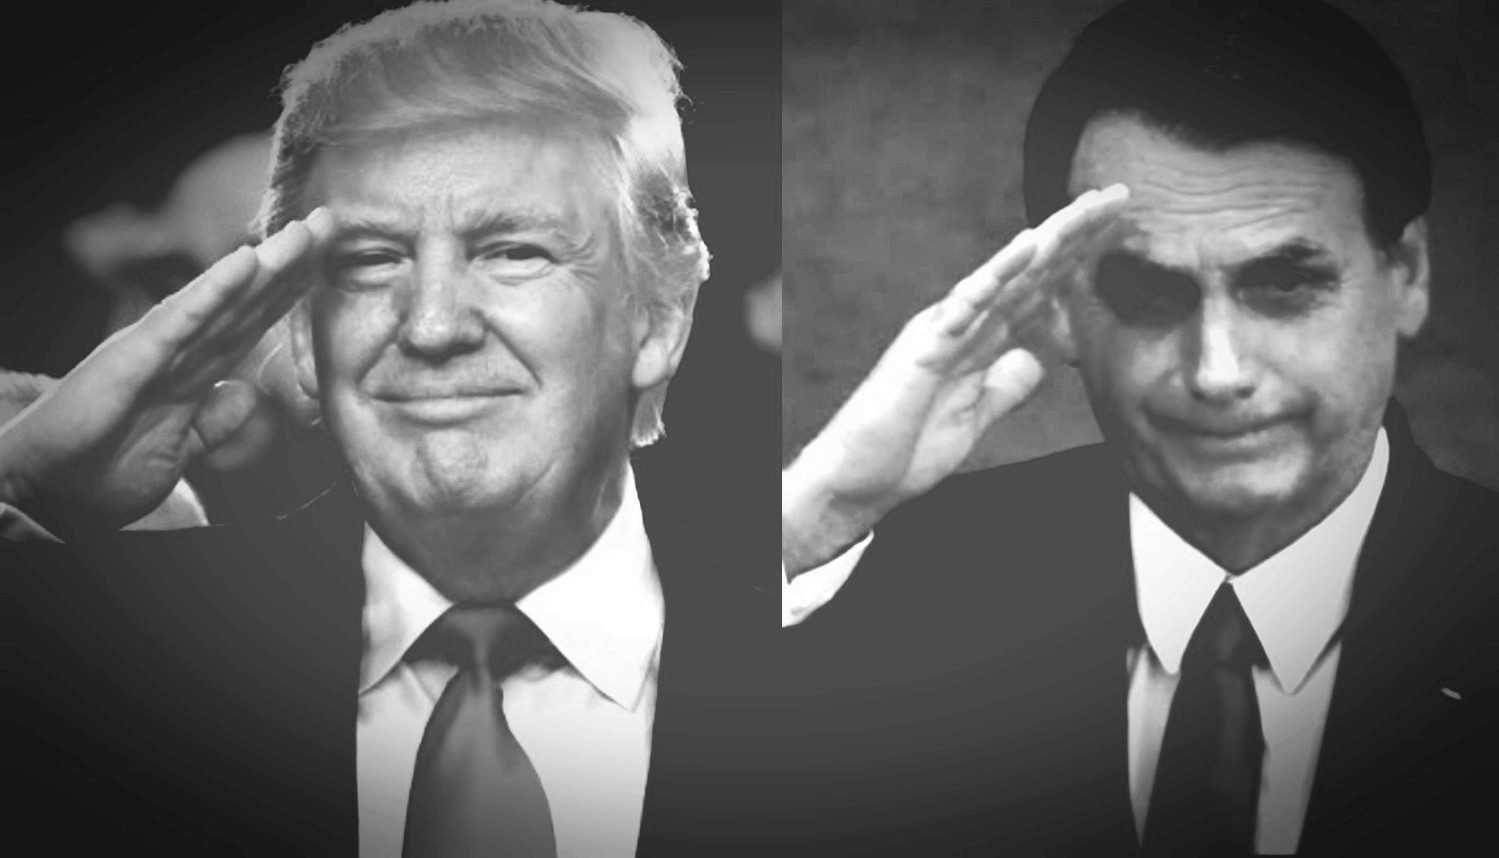 Donald Trump/Jair Bolsonaro